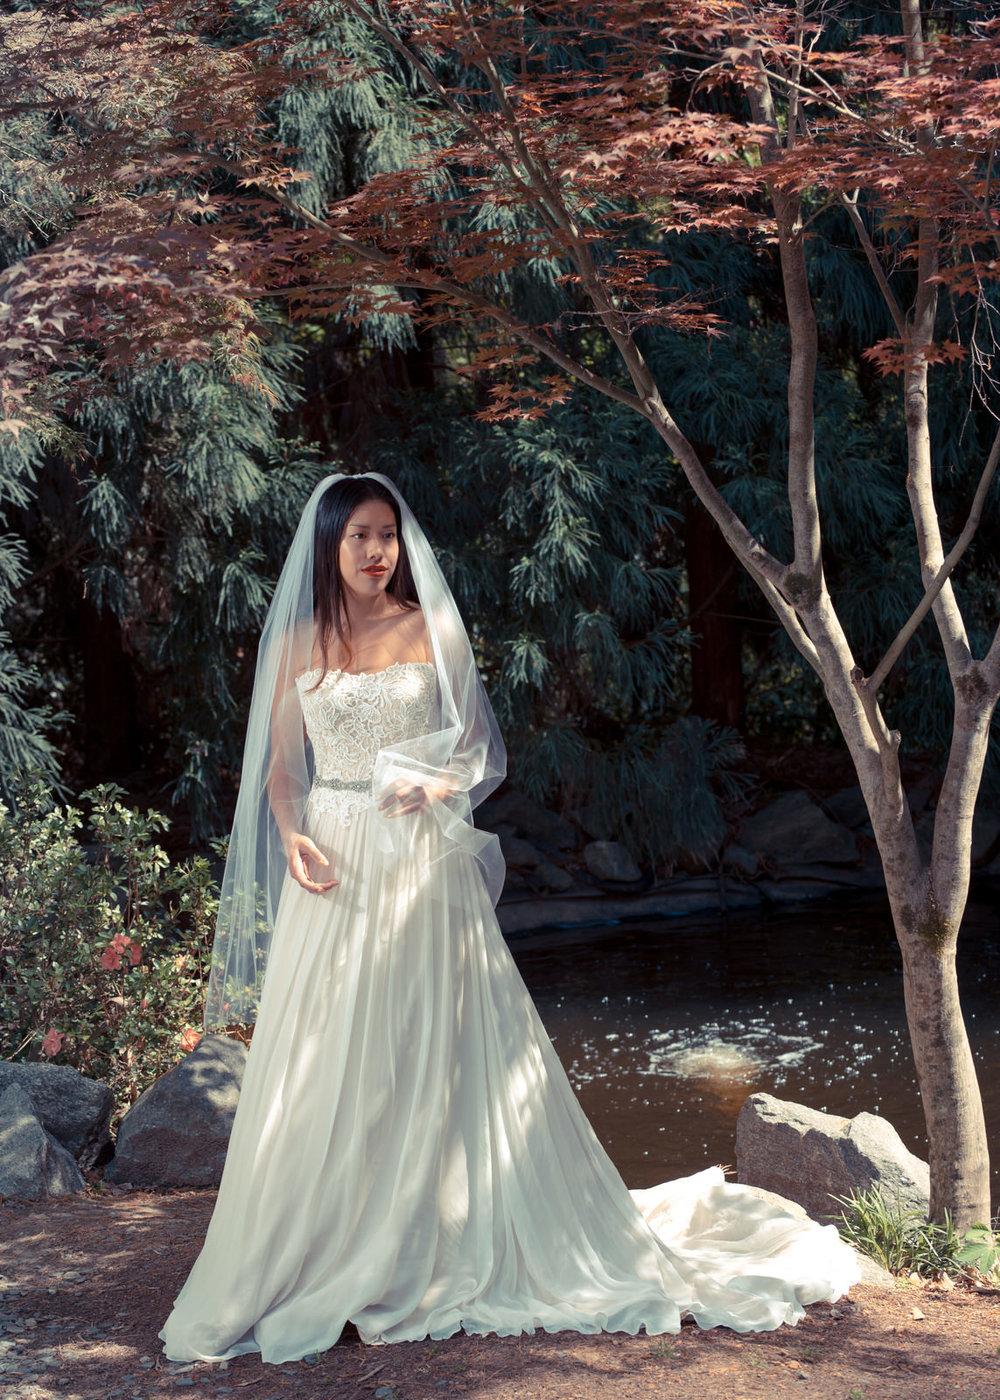 Bridal Portraits by the Koi Pond